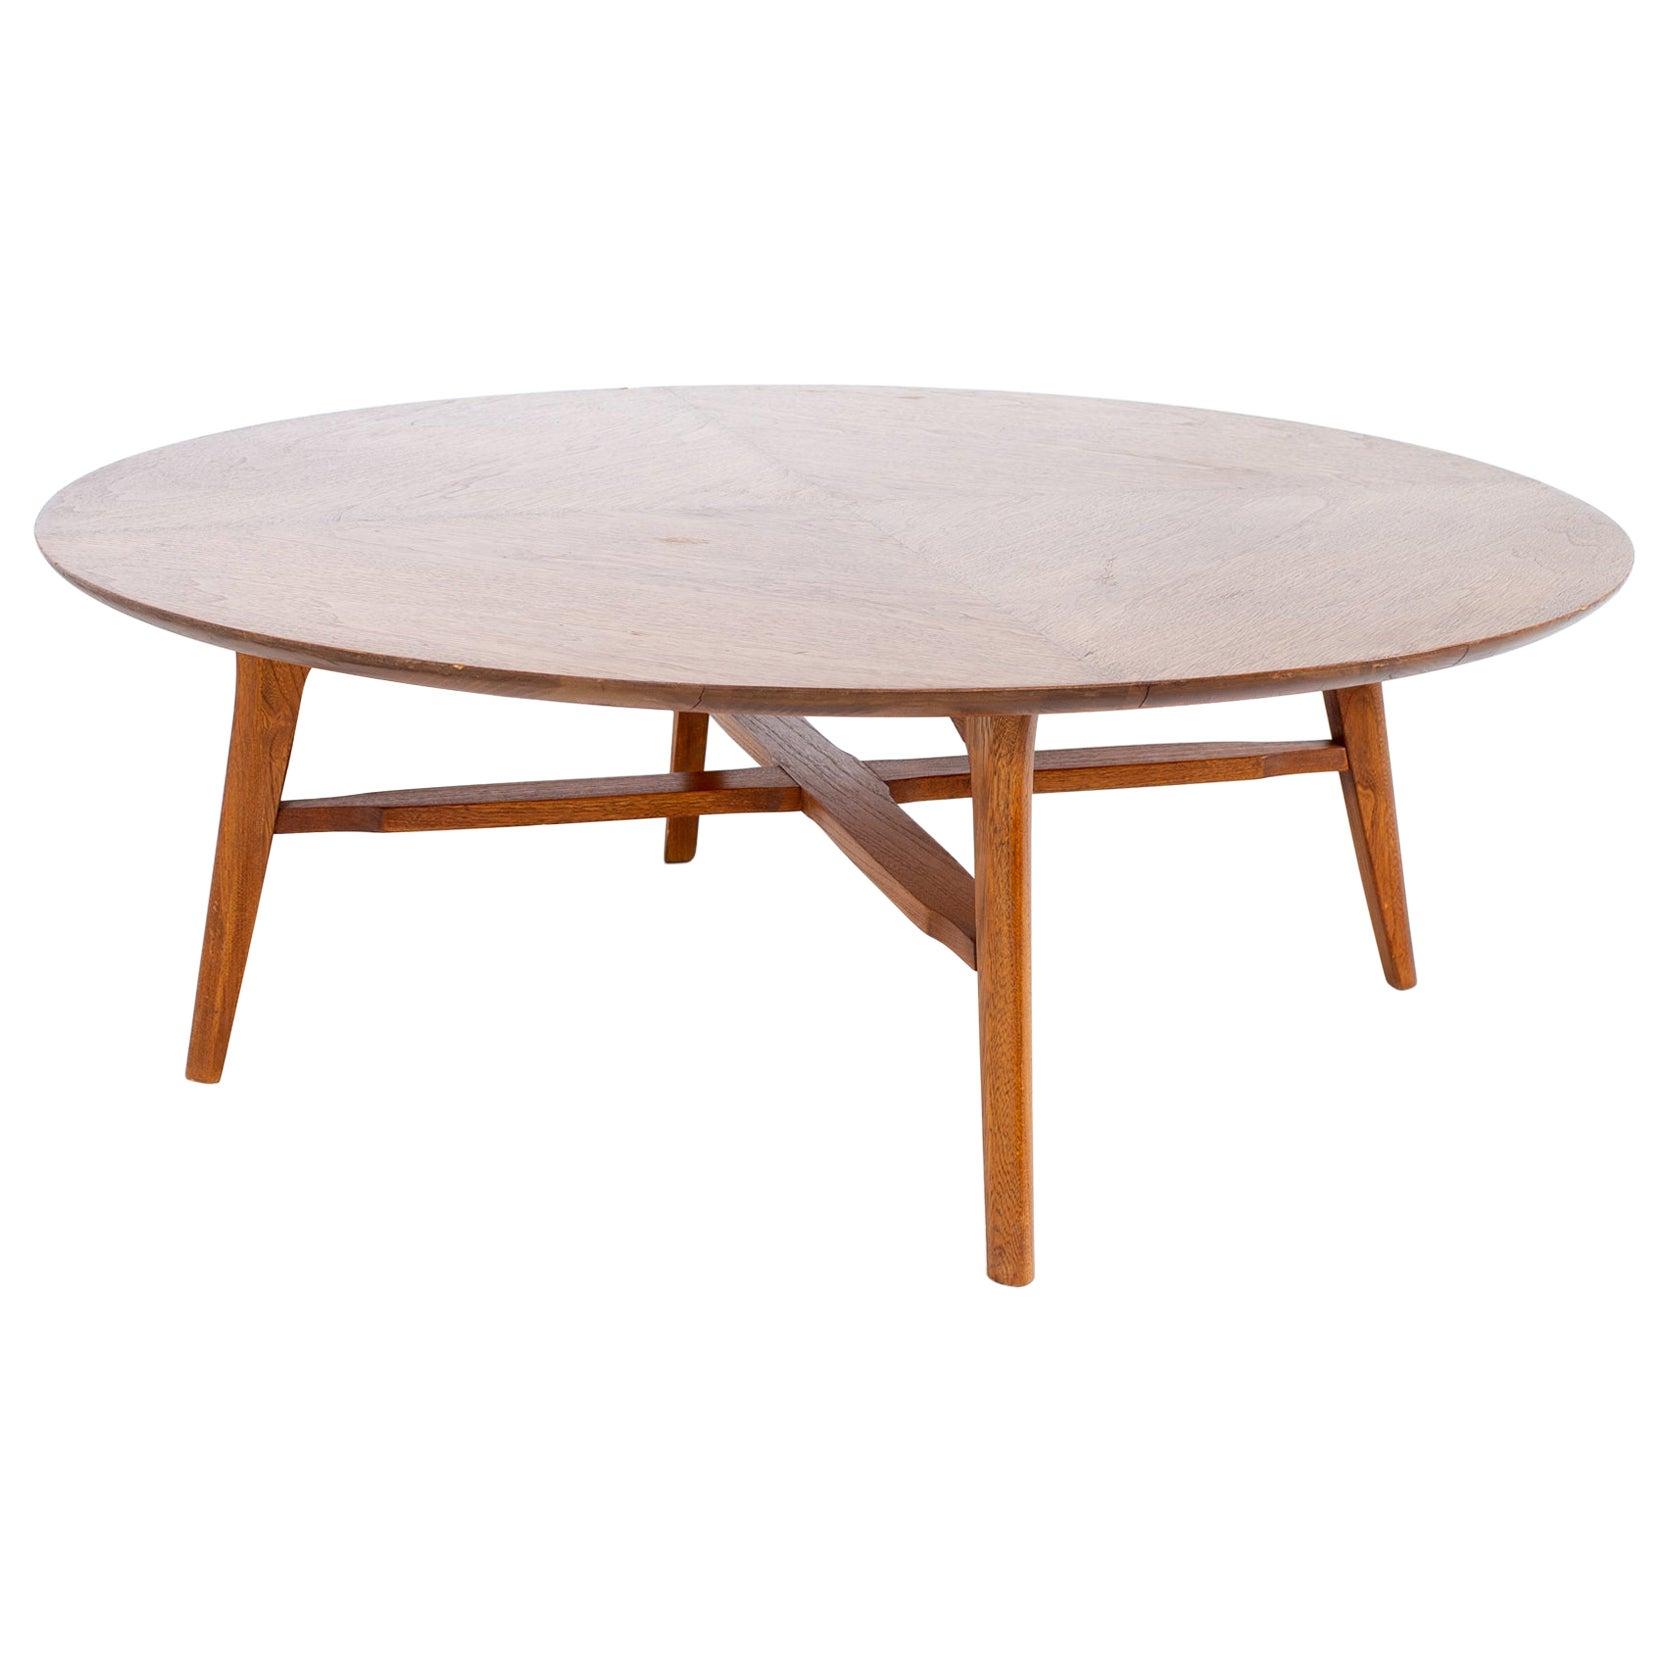 Merton Gershun American Martinsville Style MCM X-Base Round Walnut Coffee Table